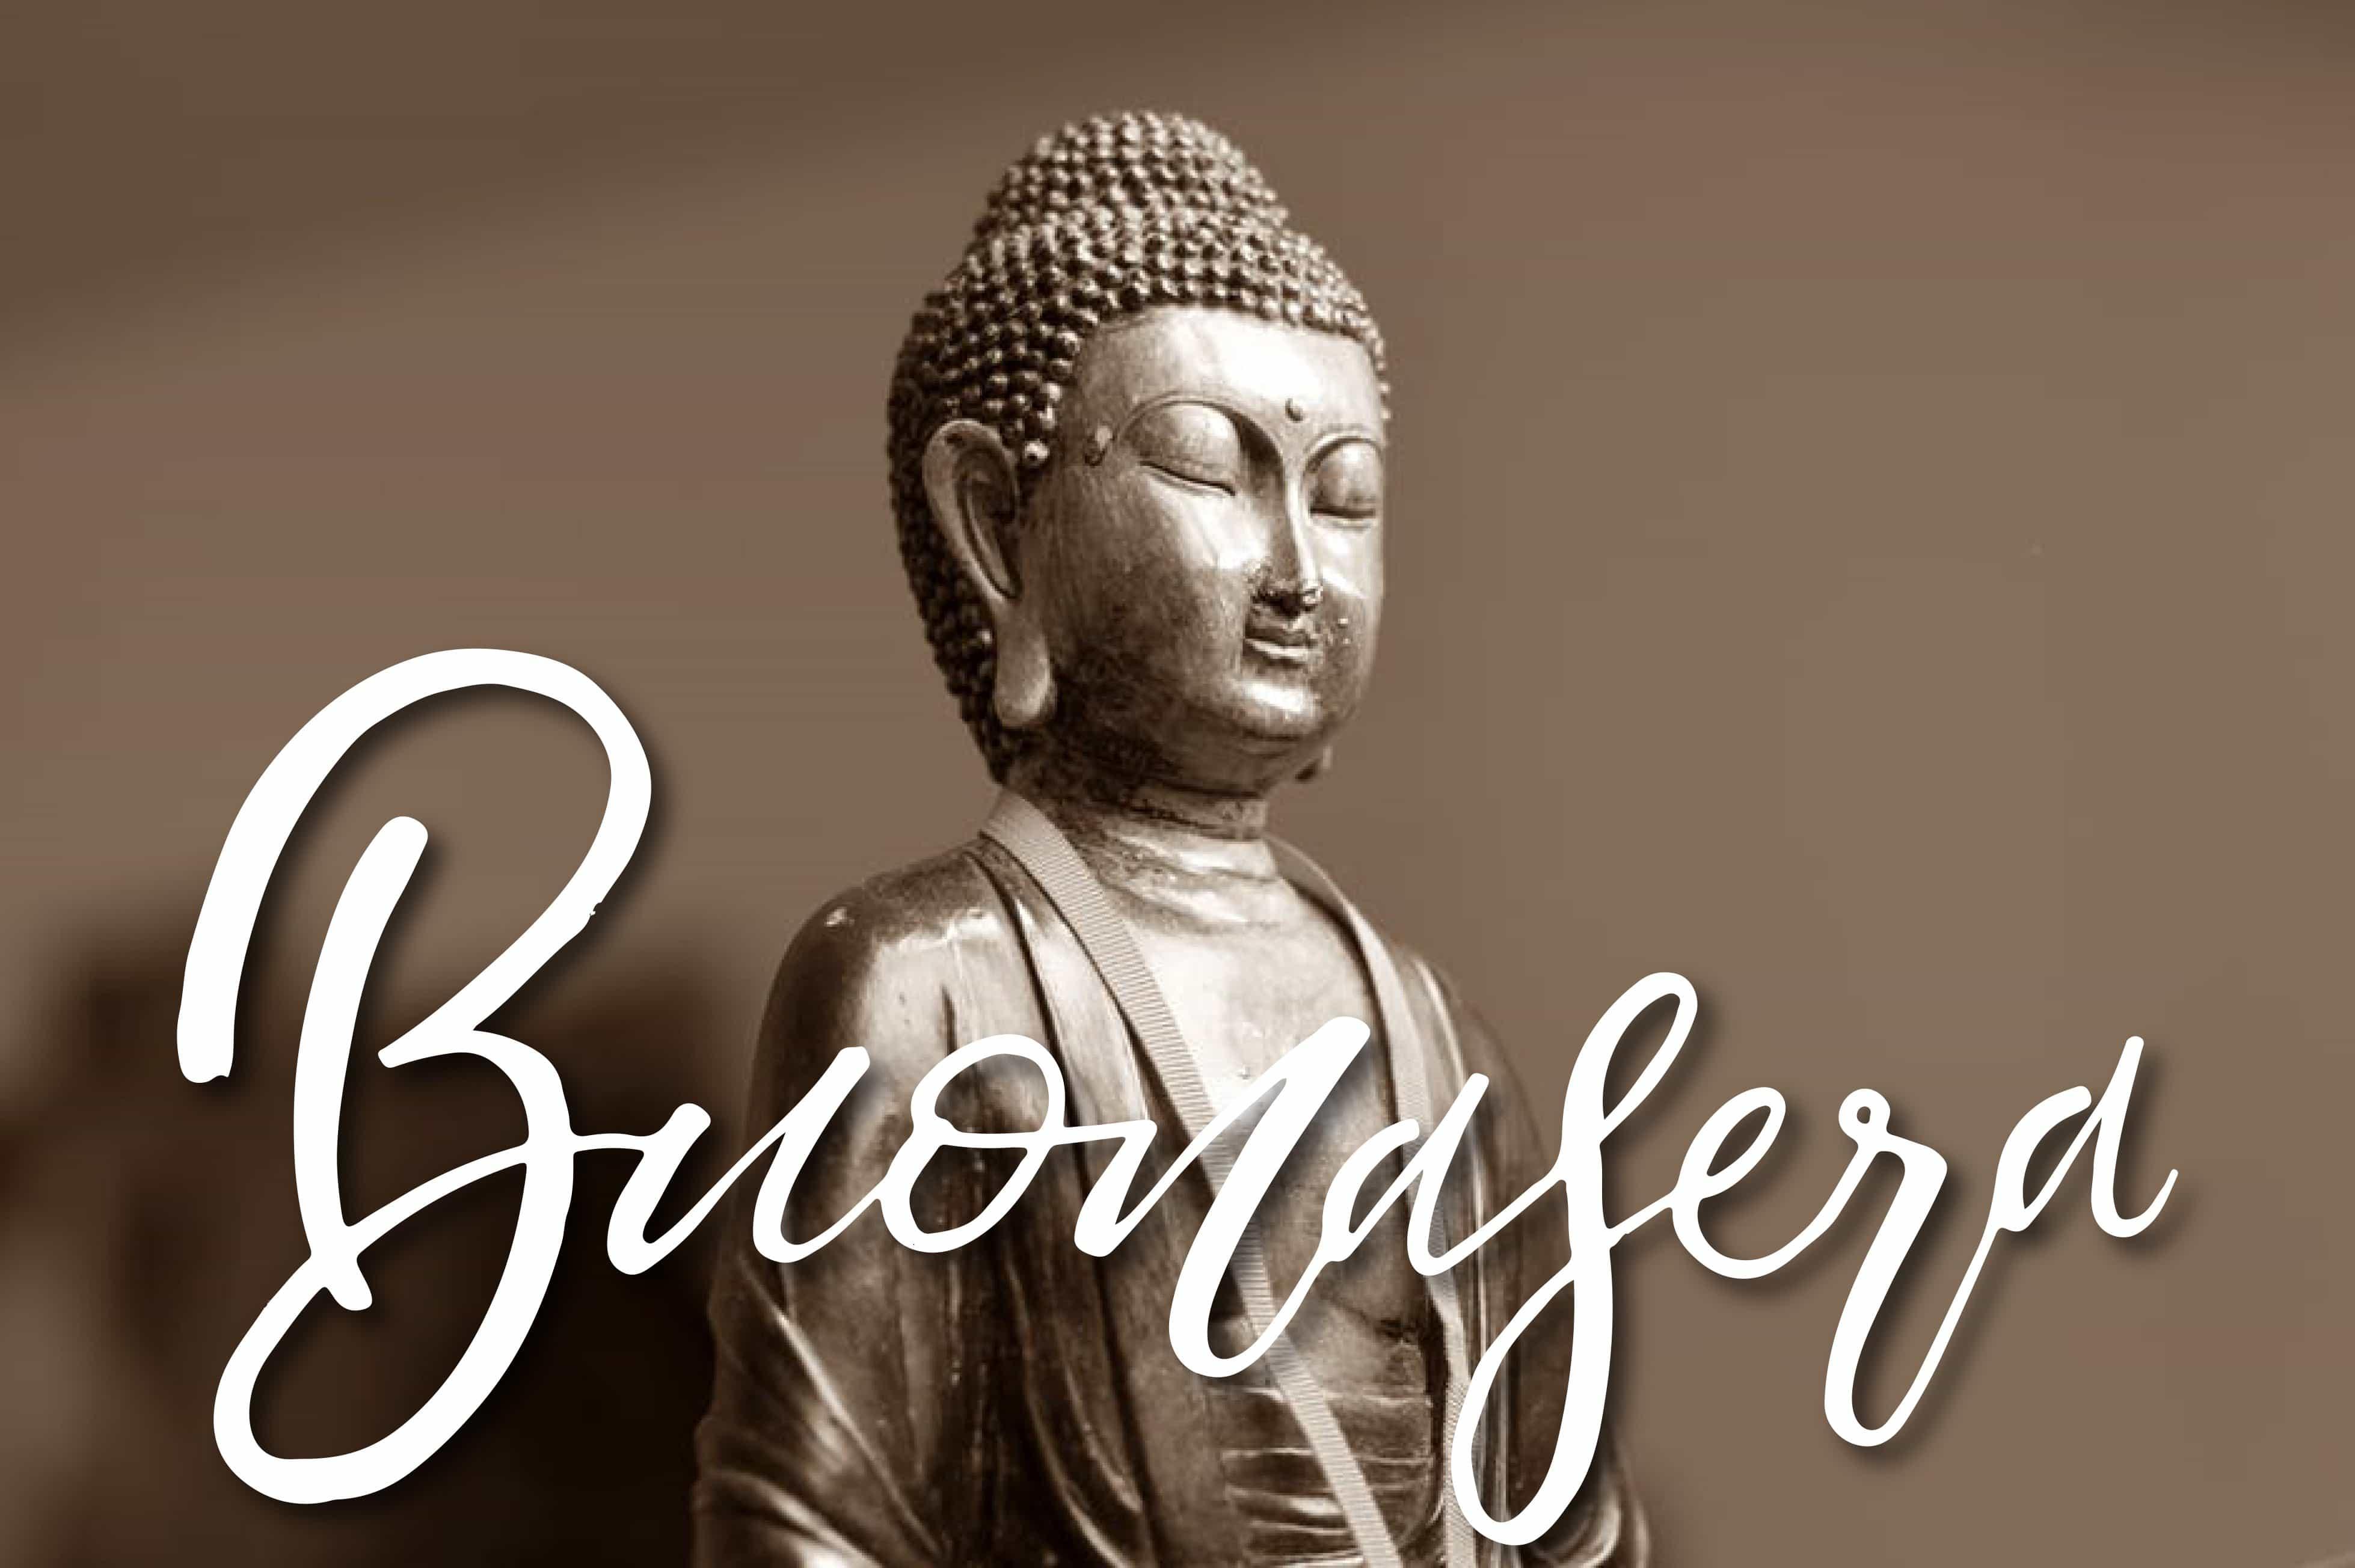 Buona sera da Buddha gratis